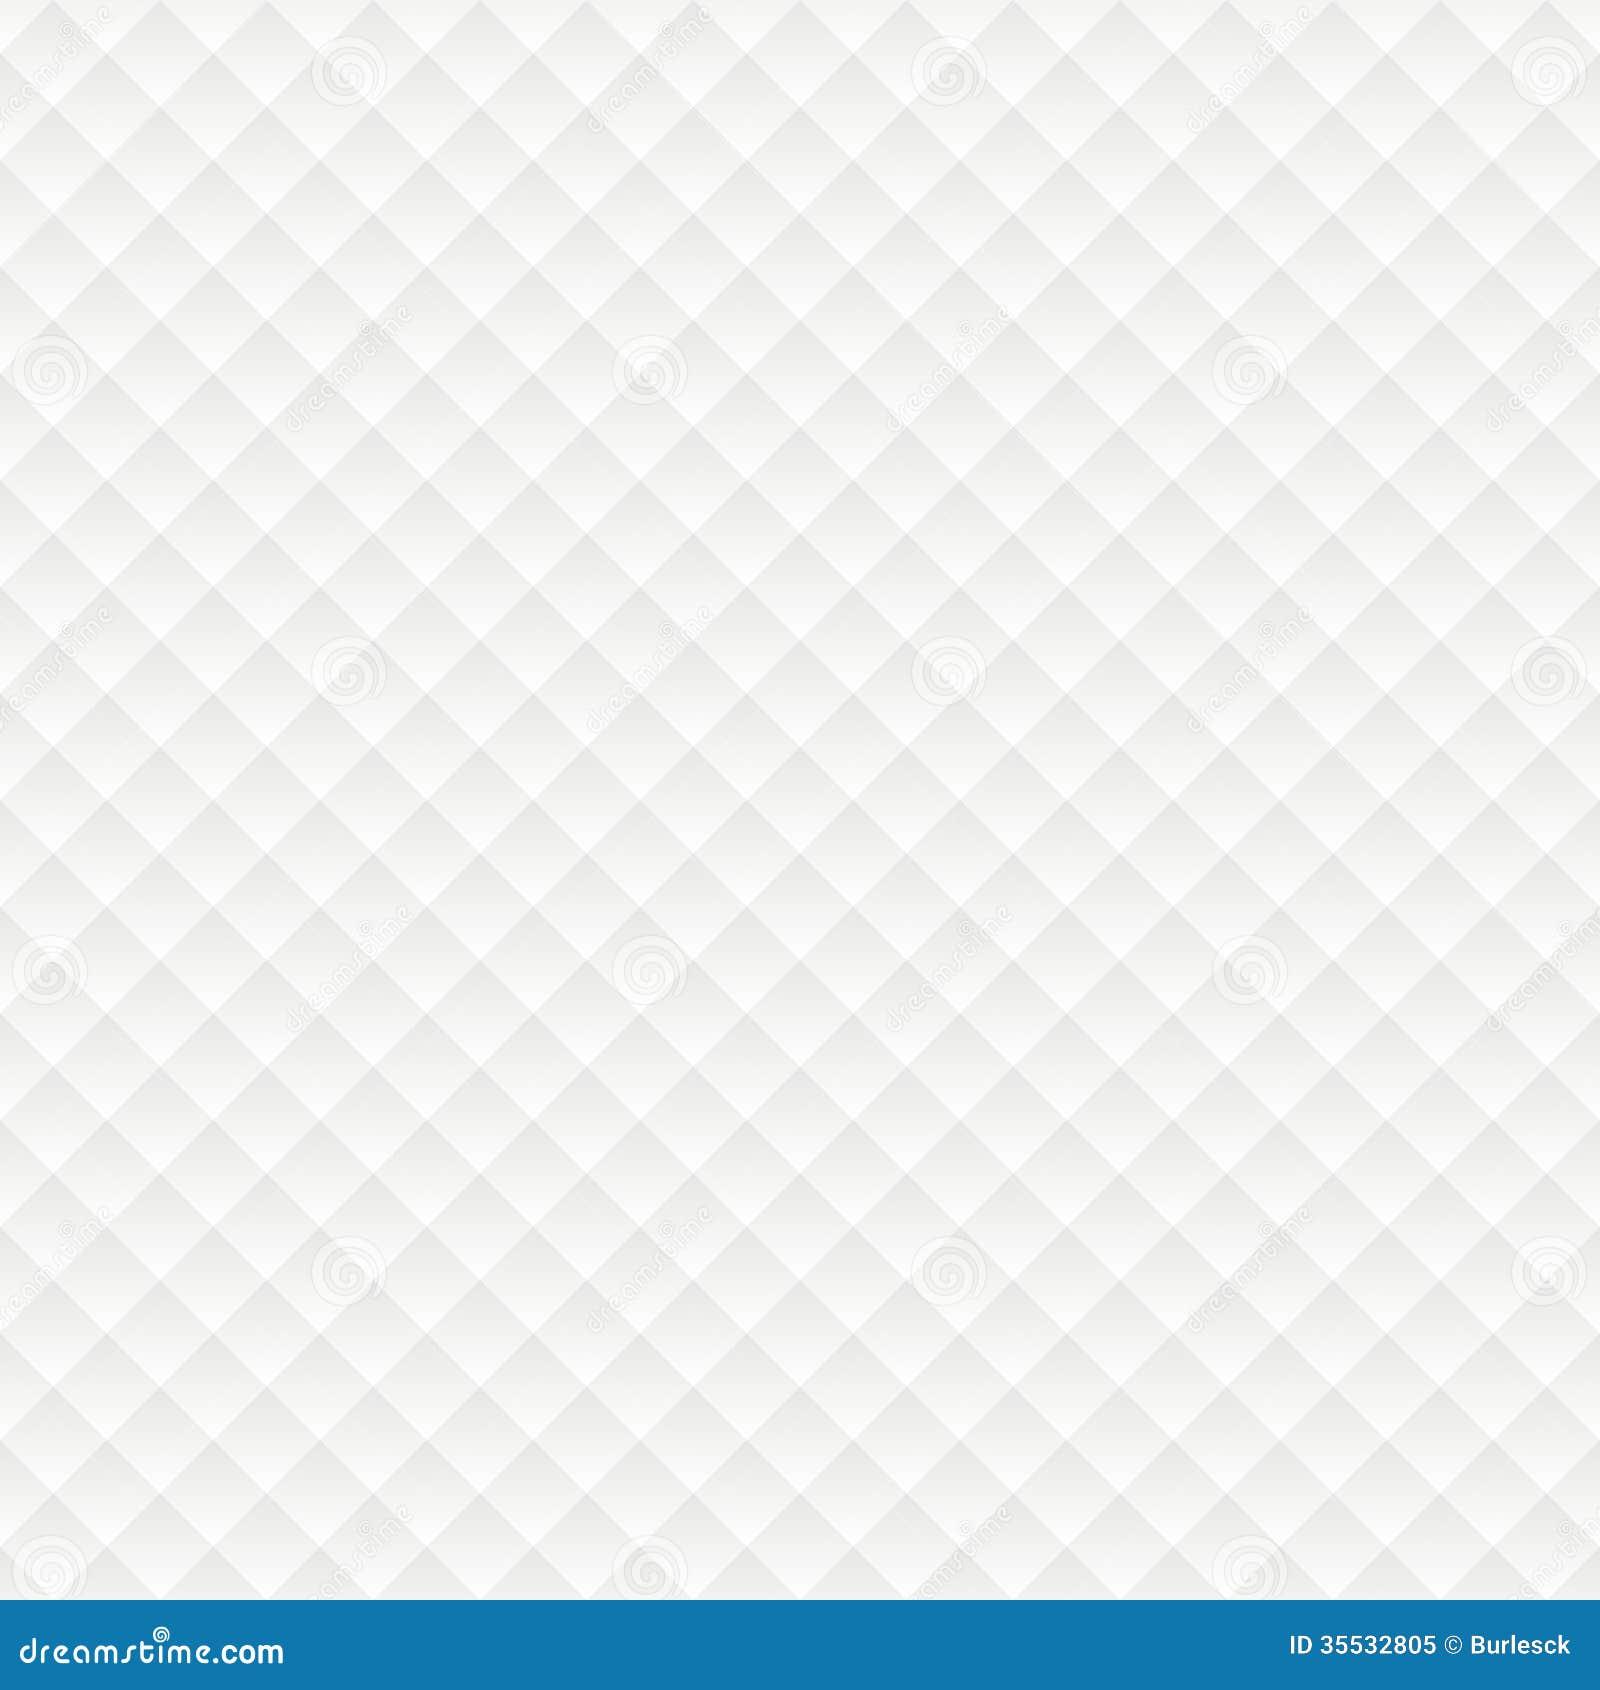 Rhombus Seamless White Background Stock Vector